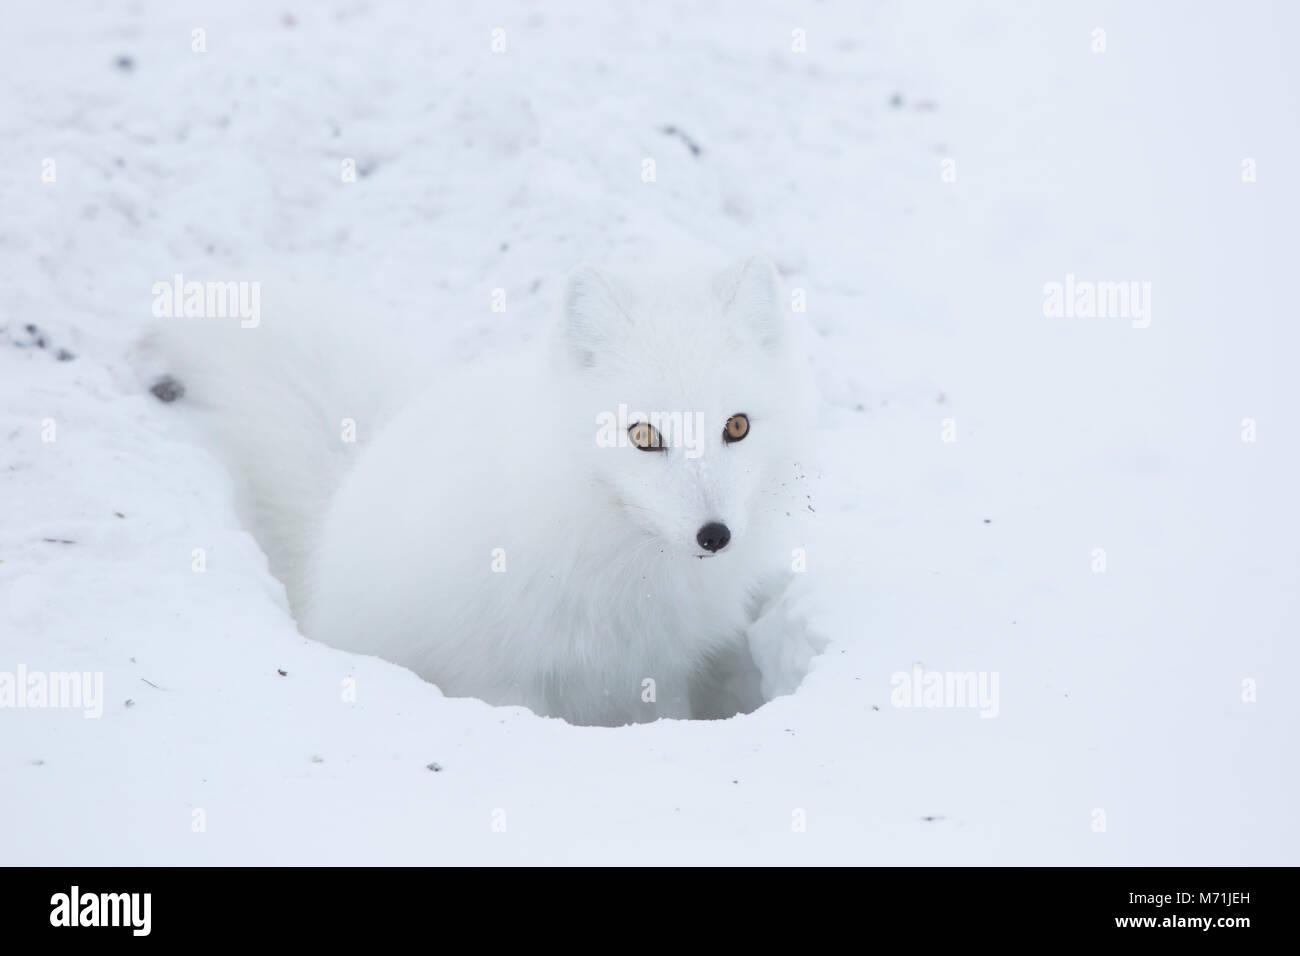 01863-01709 Arctic Fox (Alopex lagopus) at food cache, Cape Churchill, Wapusk National Park, Churchill, MB Canada - Stock Image